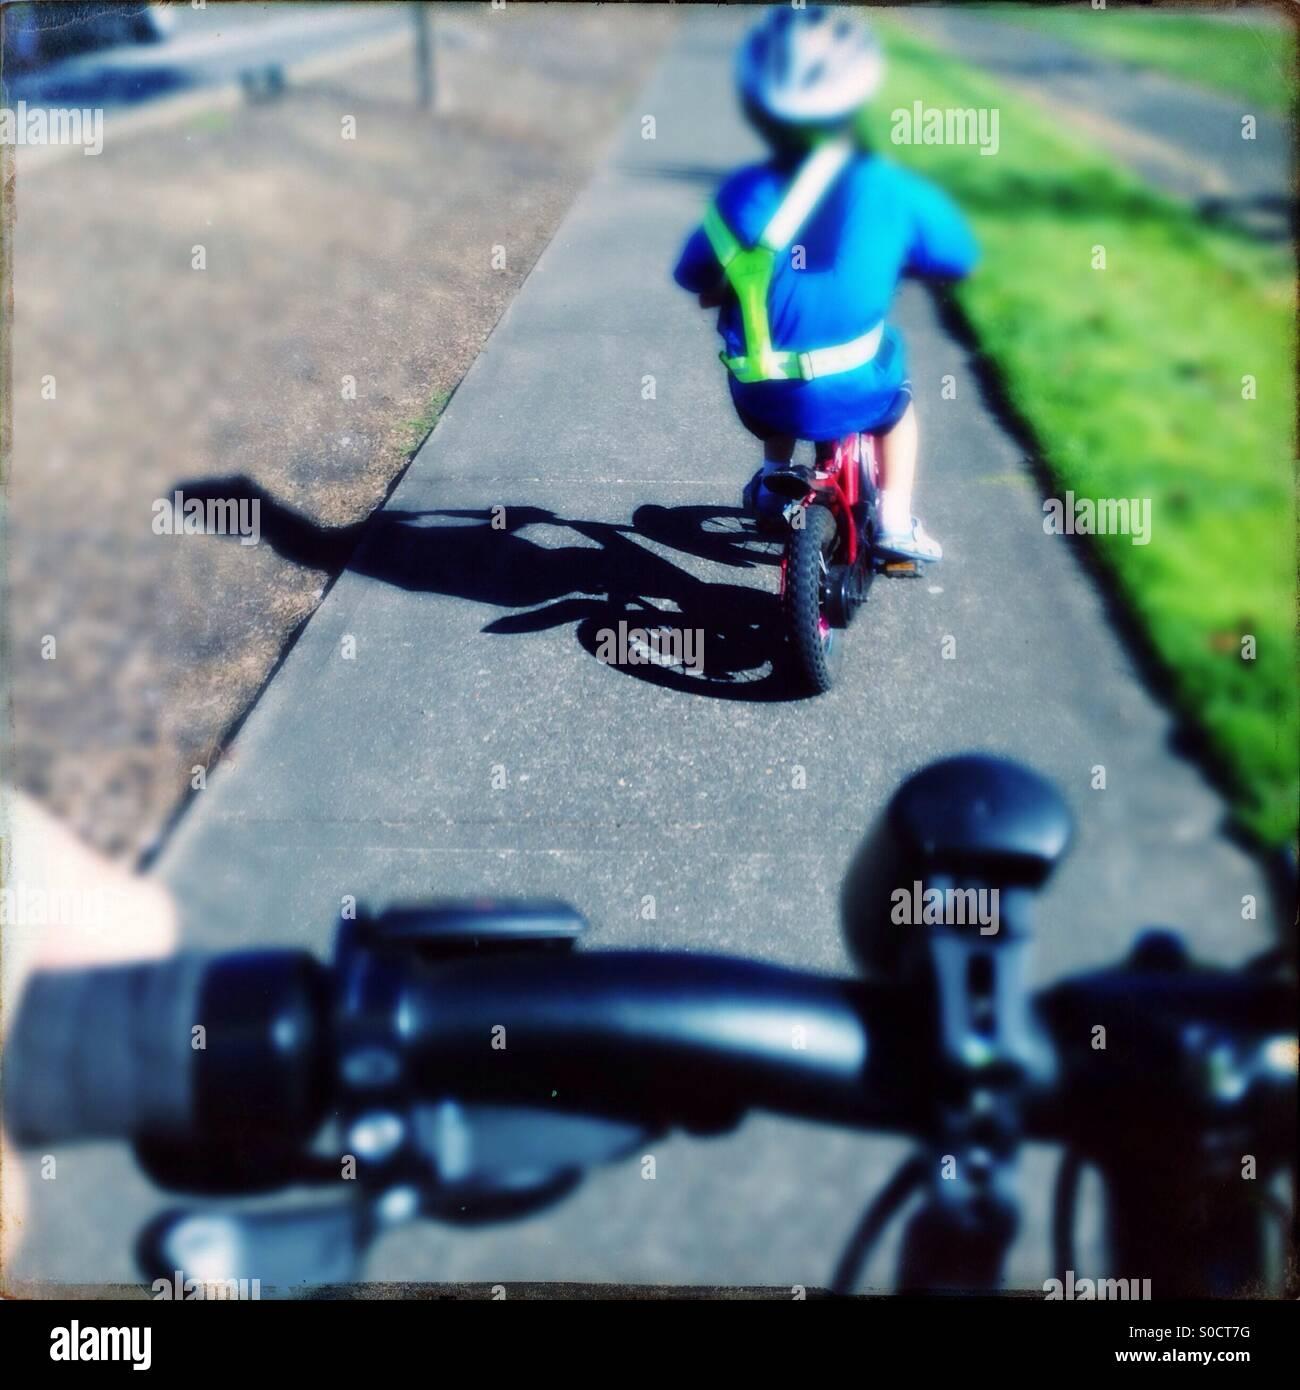 Child riding bicycle sidewalk wearing safety vest - Stock Image